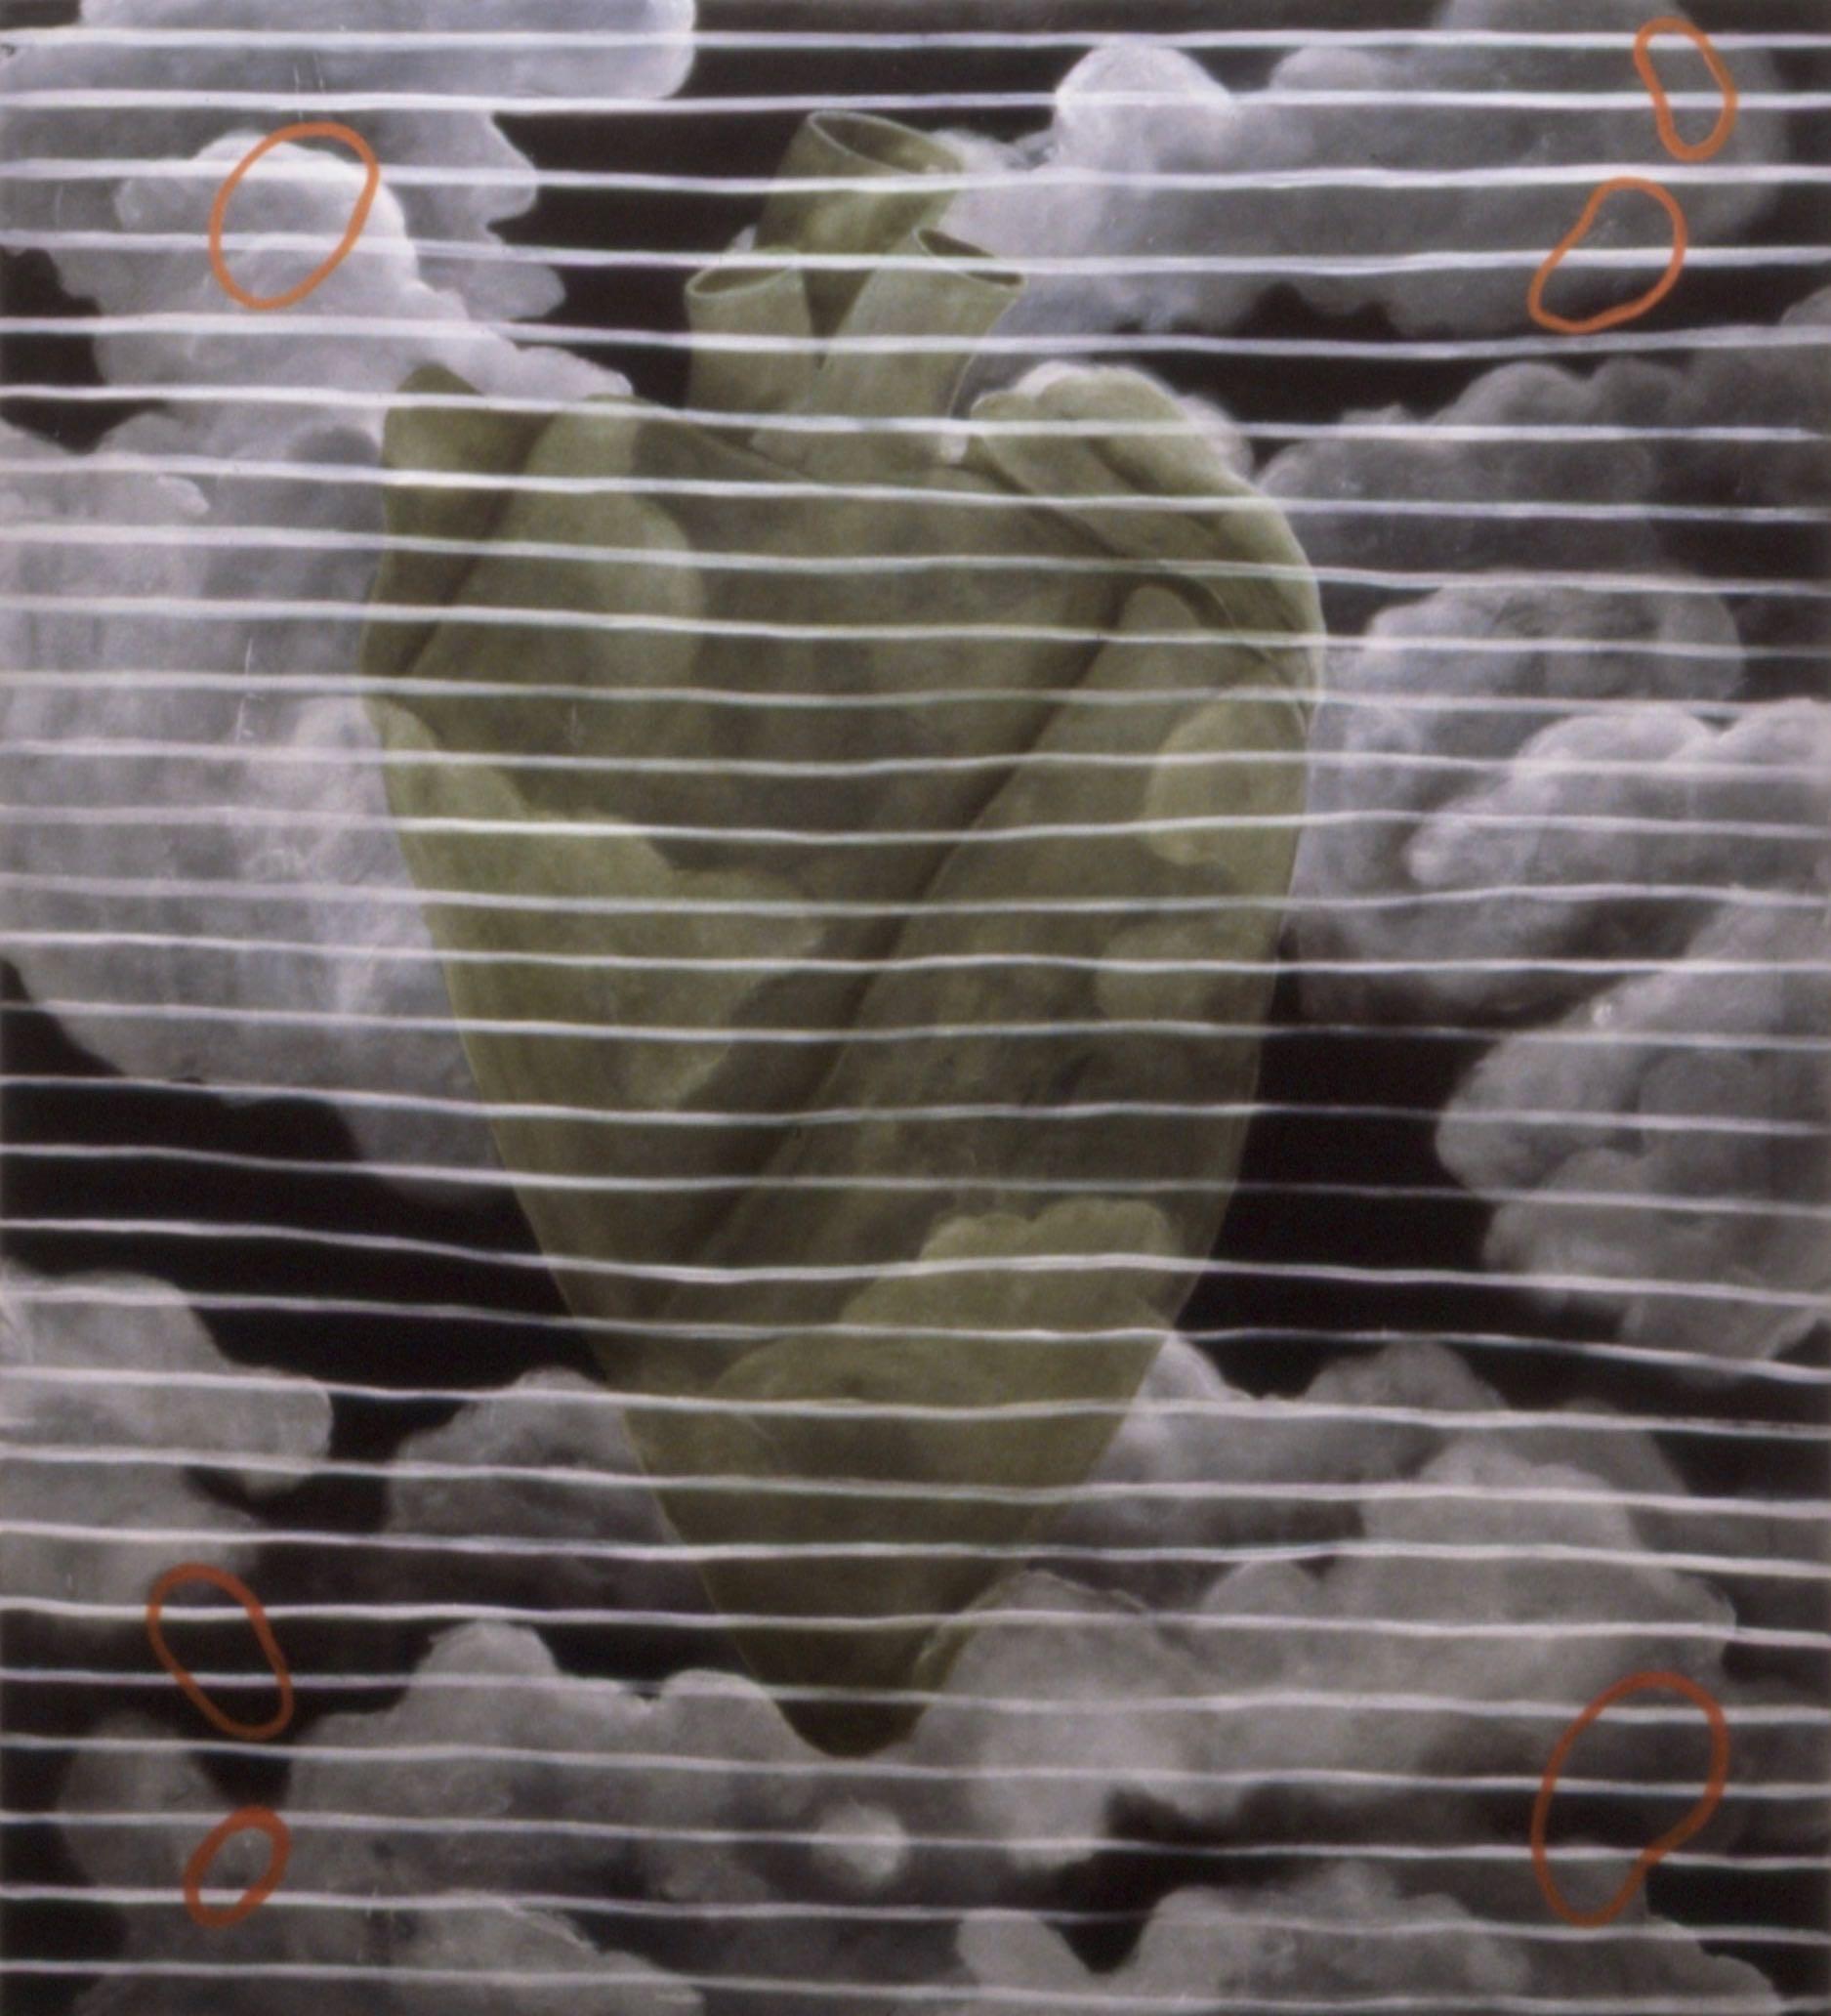 Stort grønt hjerte  150x140 cm opl 1996